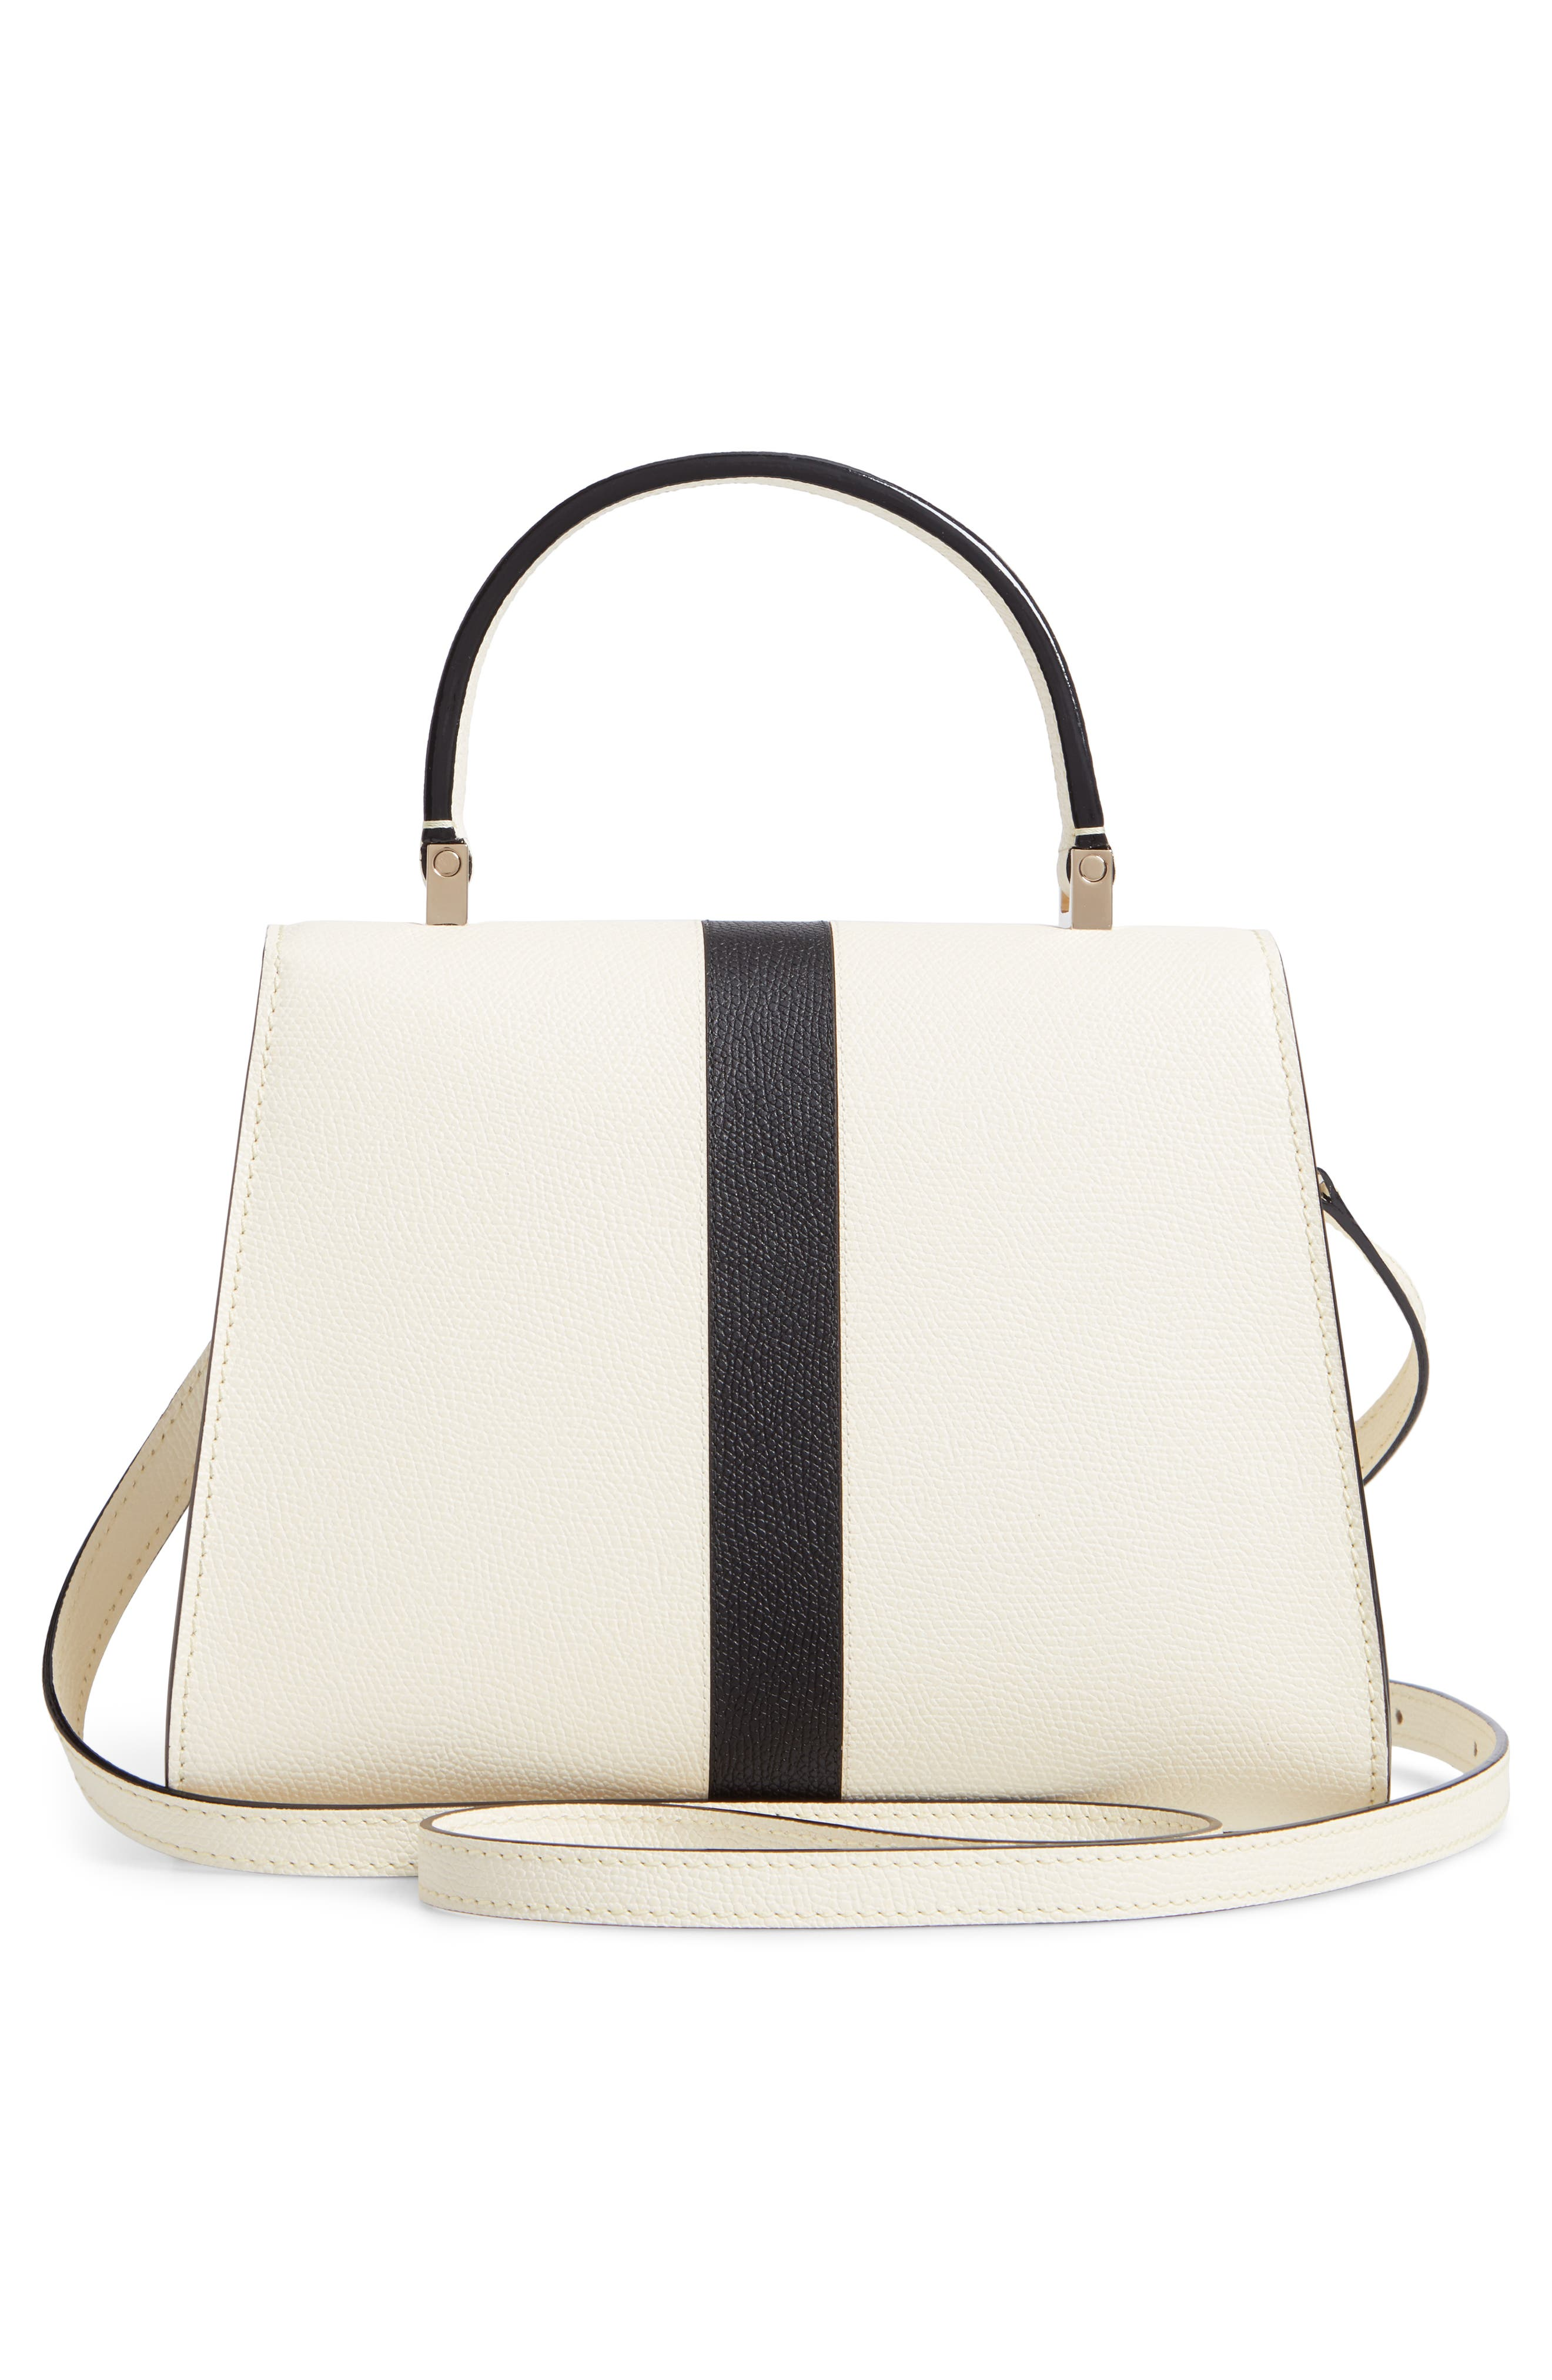 Mini Iside Top Handle Bag,                             Alternate thumbnail 3, color,                             WHITE/ BLACK